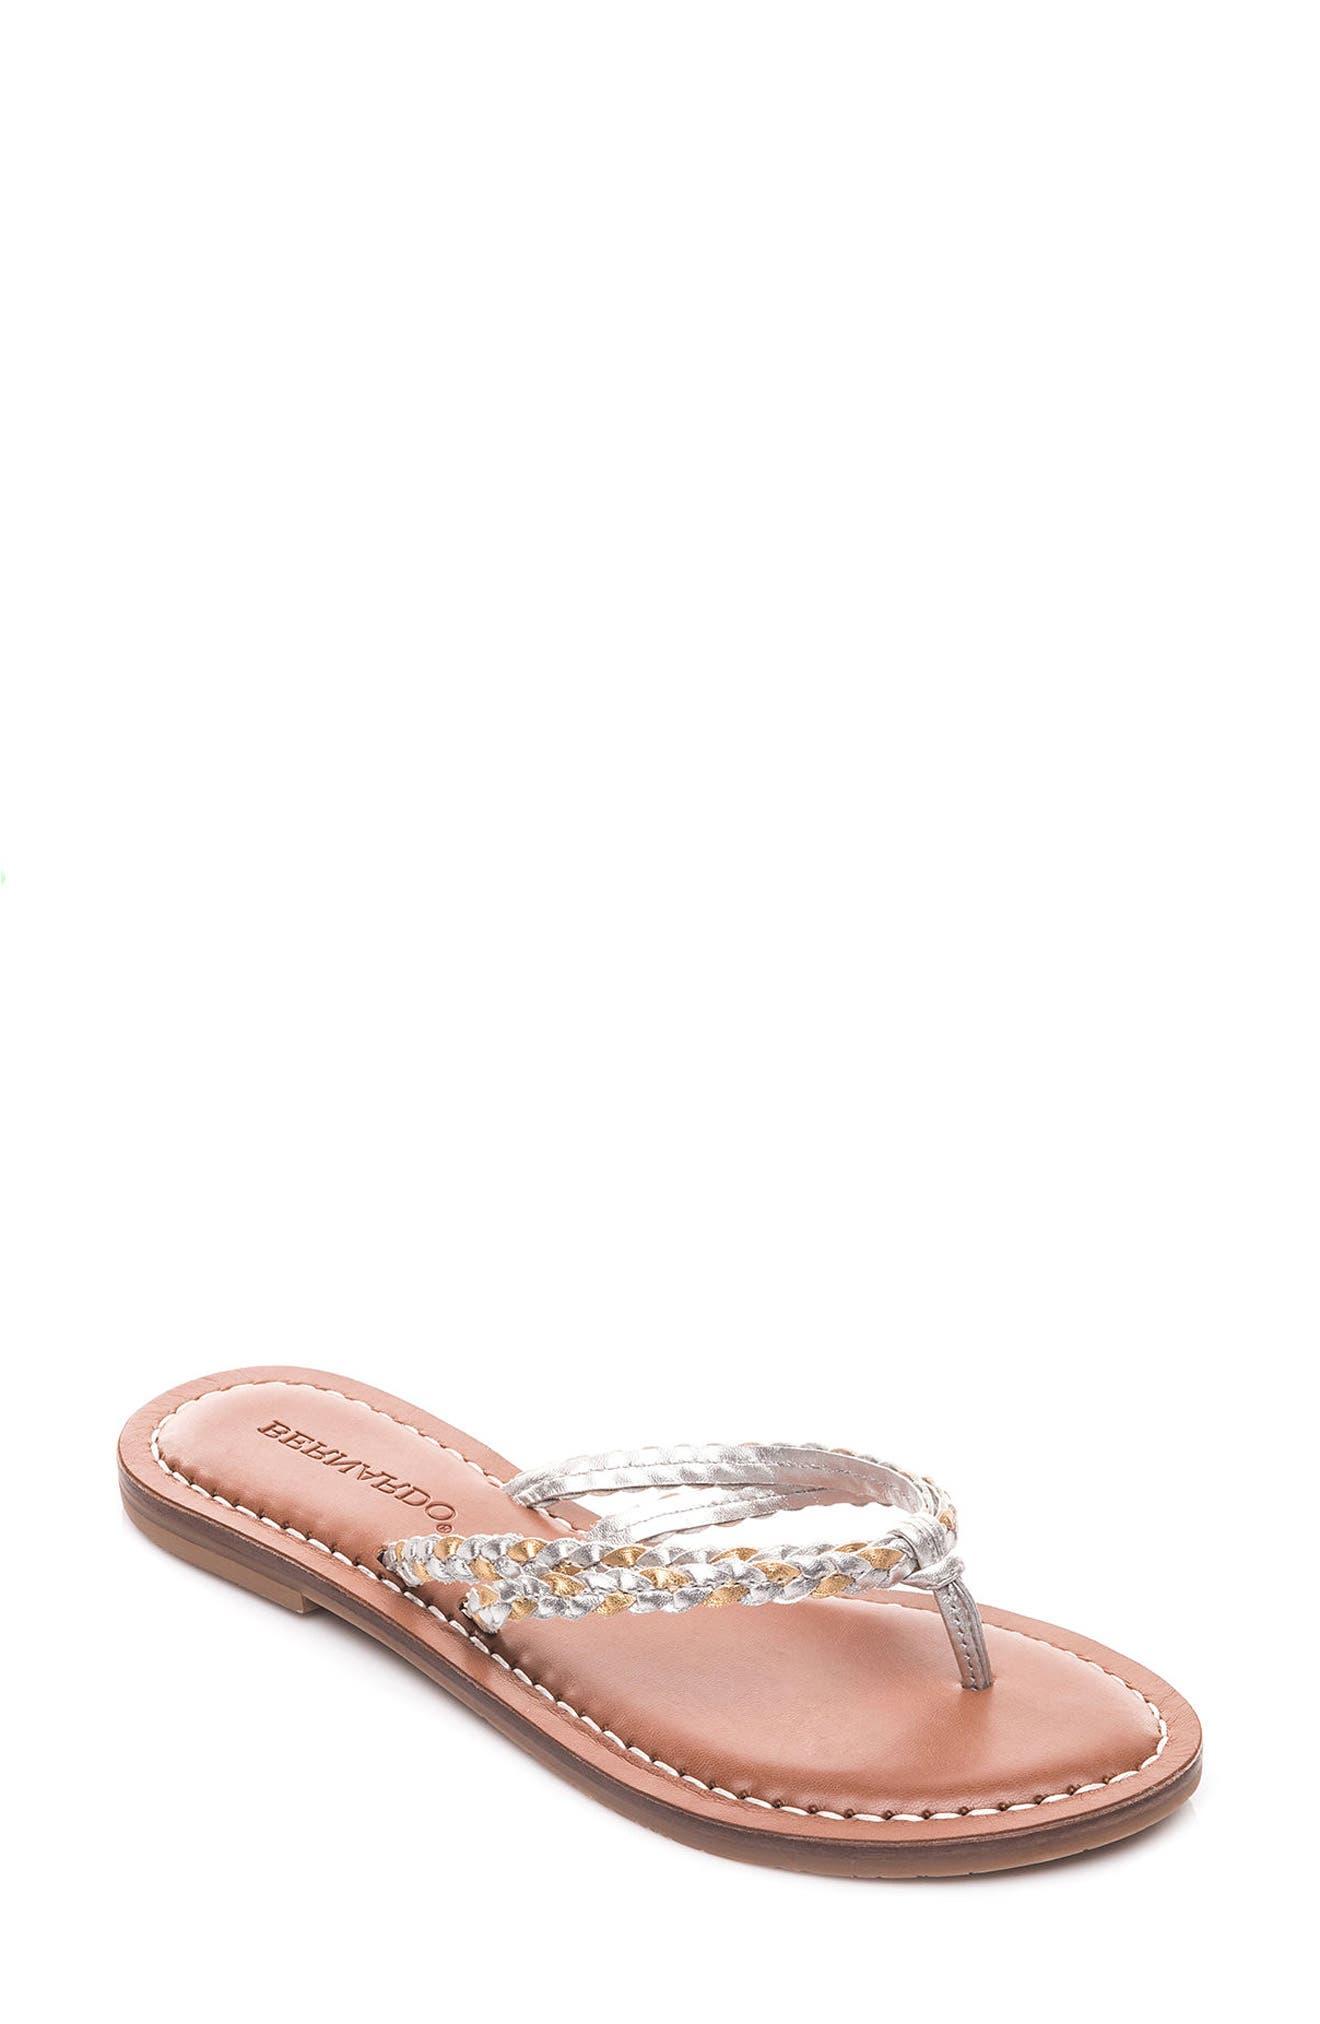 Alternate Image 1 Selected - Bernardo Greta Braided Strap Sandal (Women)